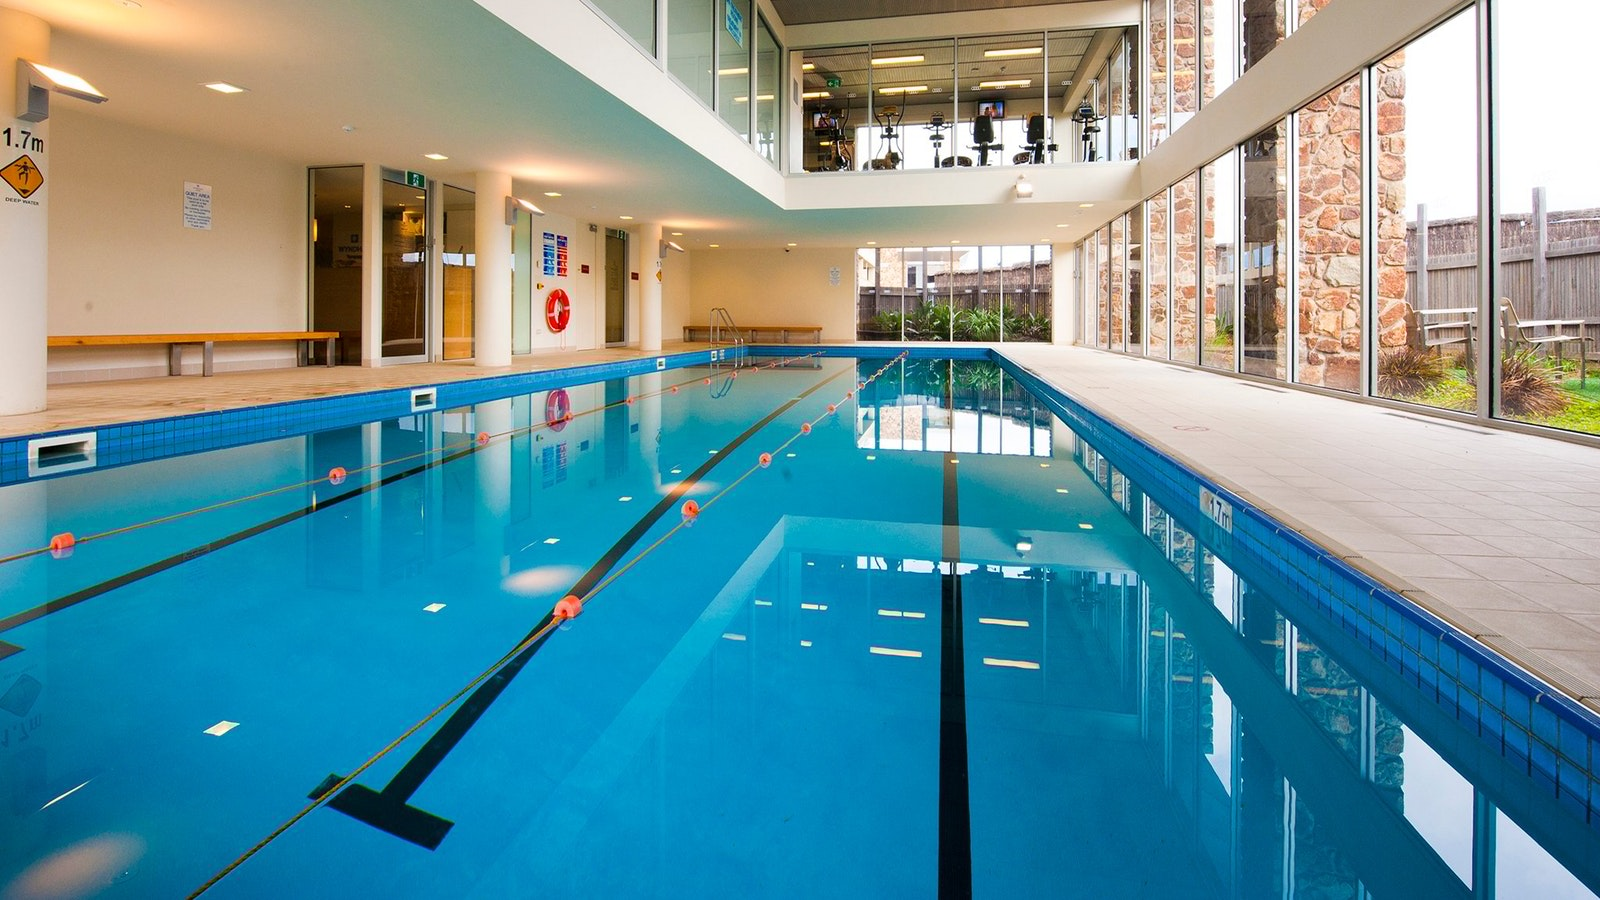 Torquay Indoor pool